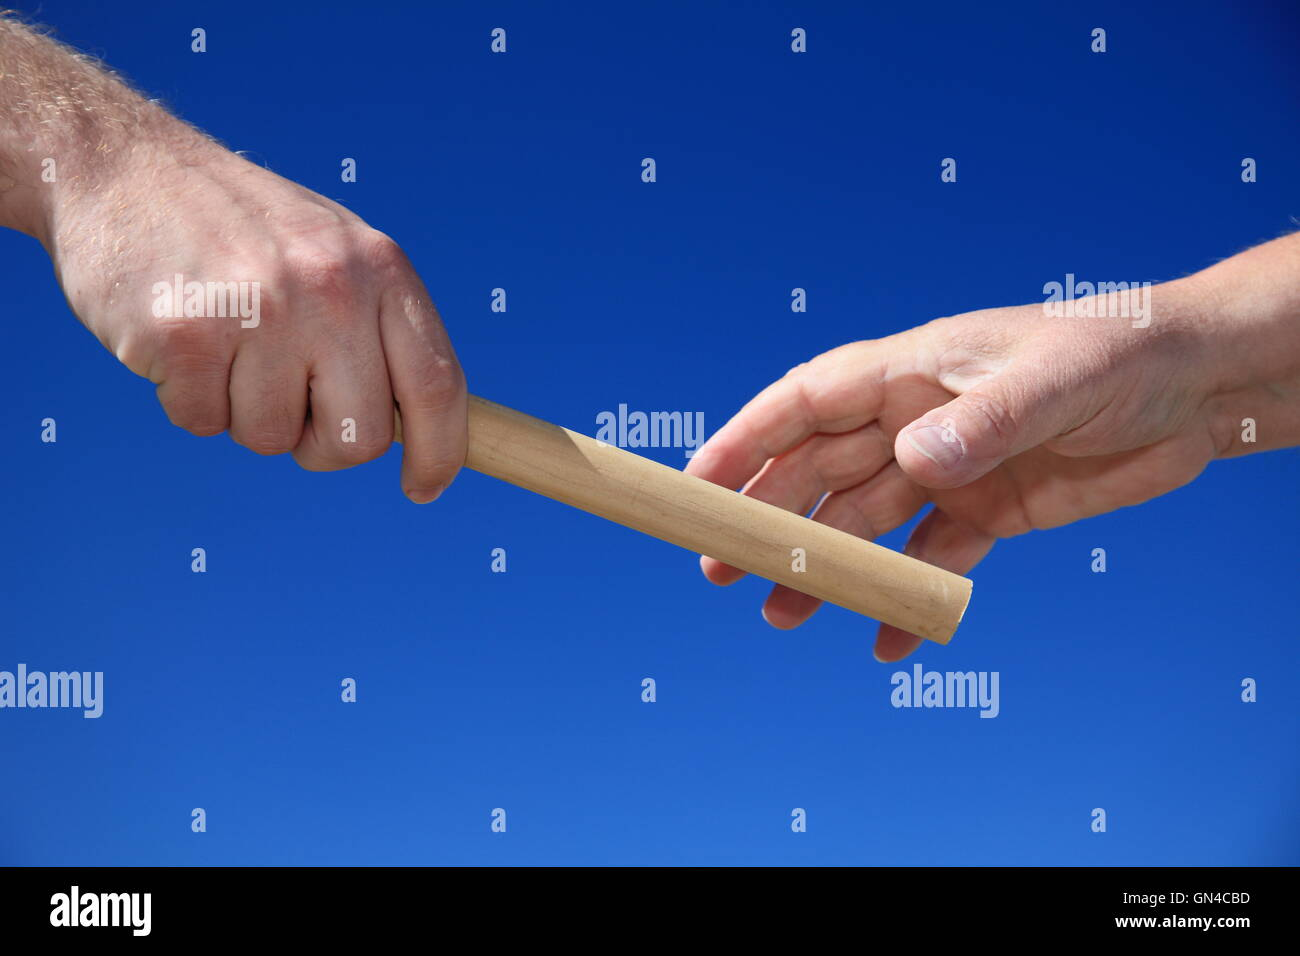 Baton - Stock Image